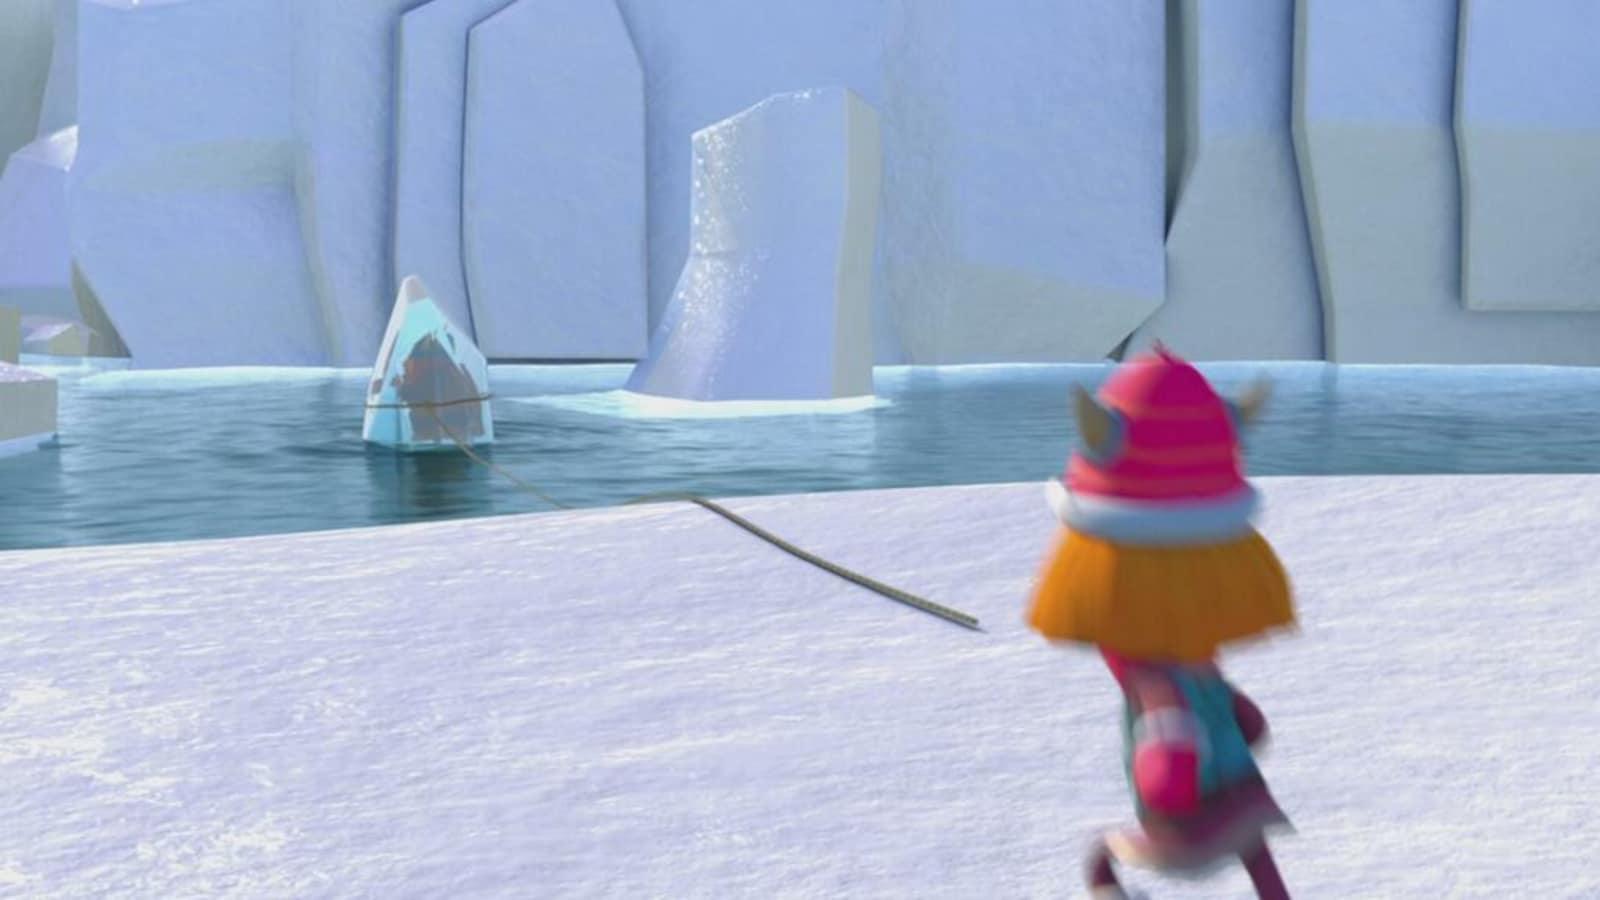 77. Olaf-ukki